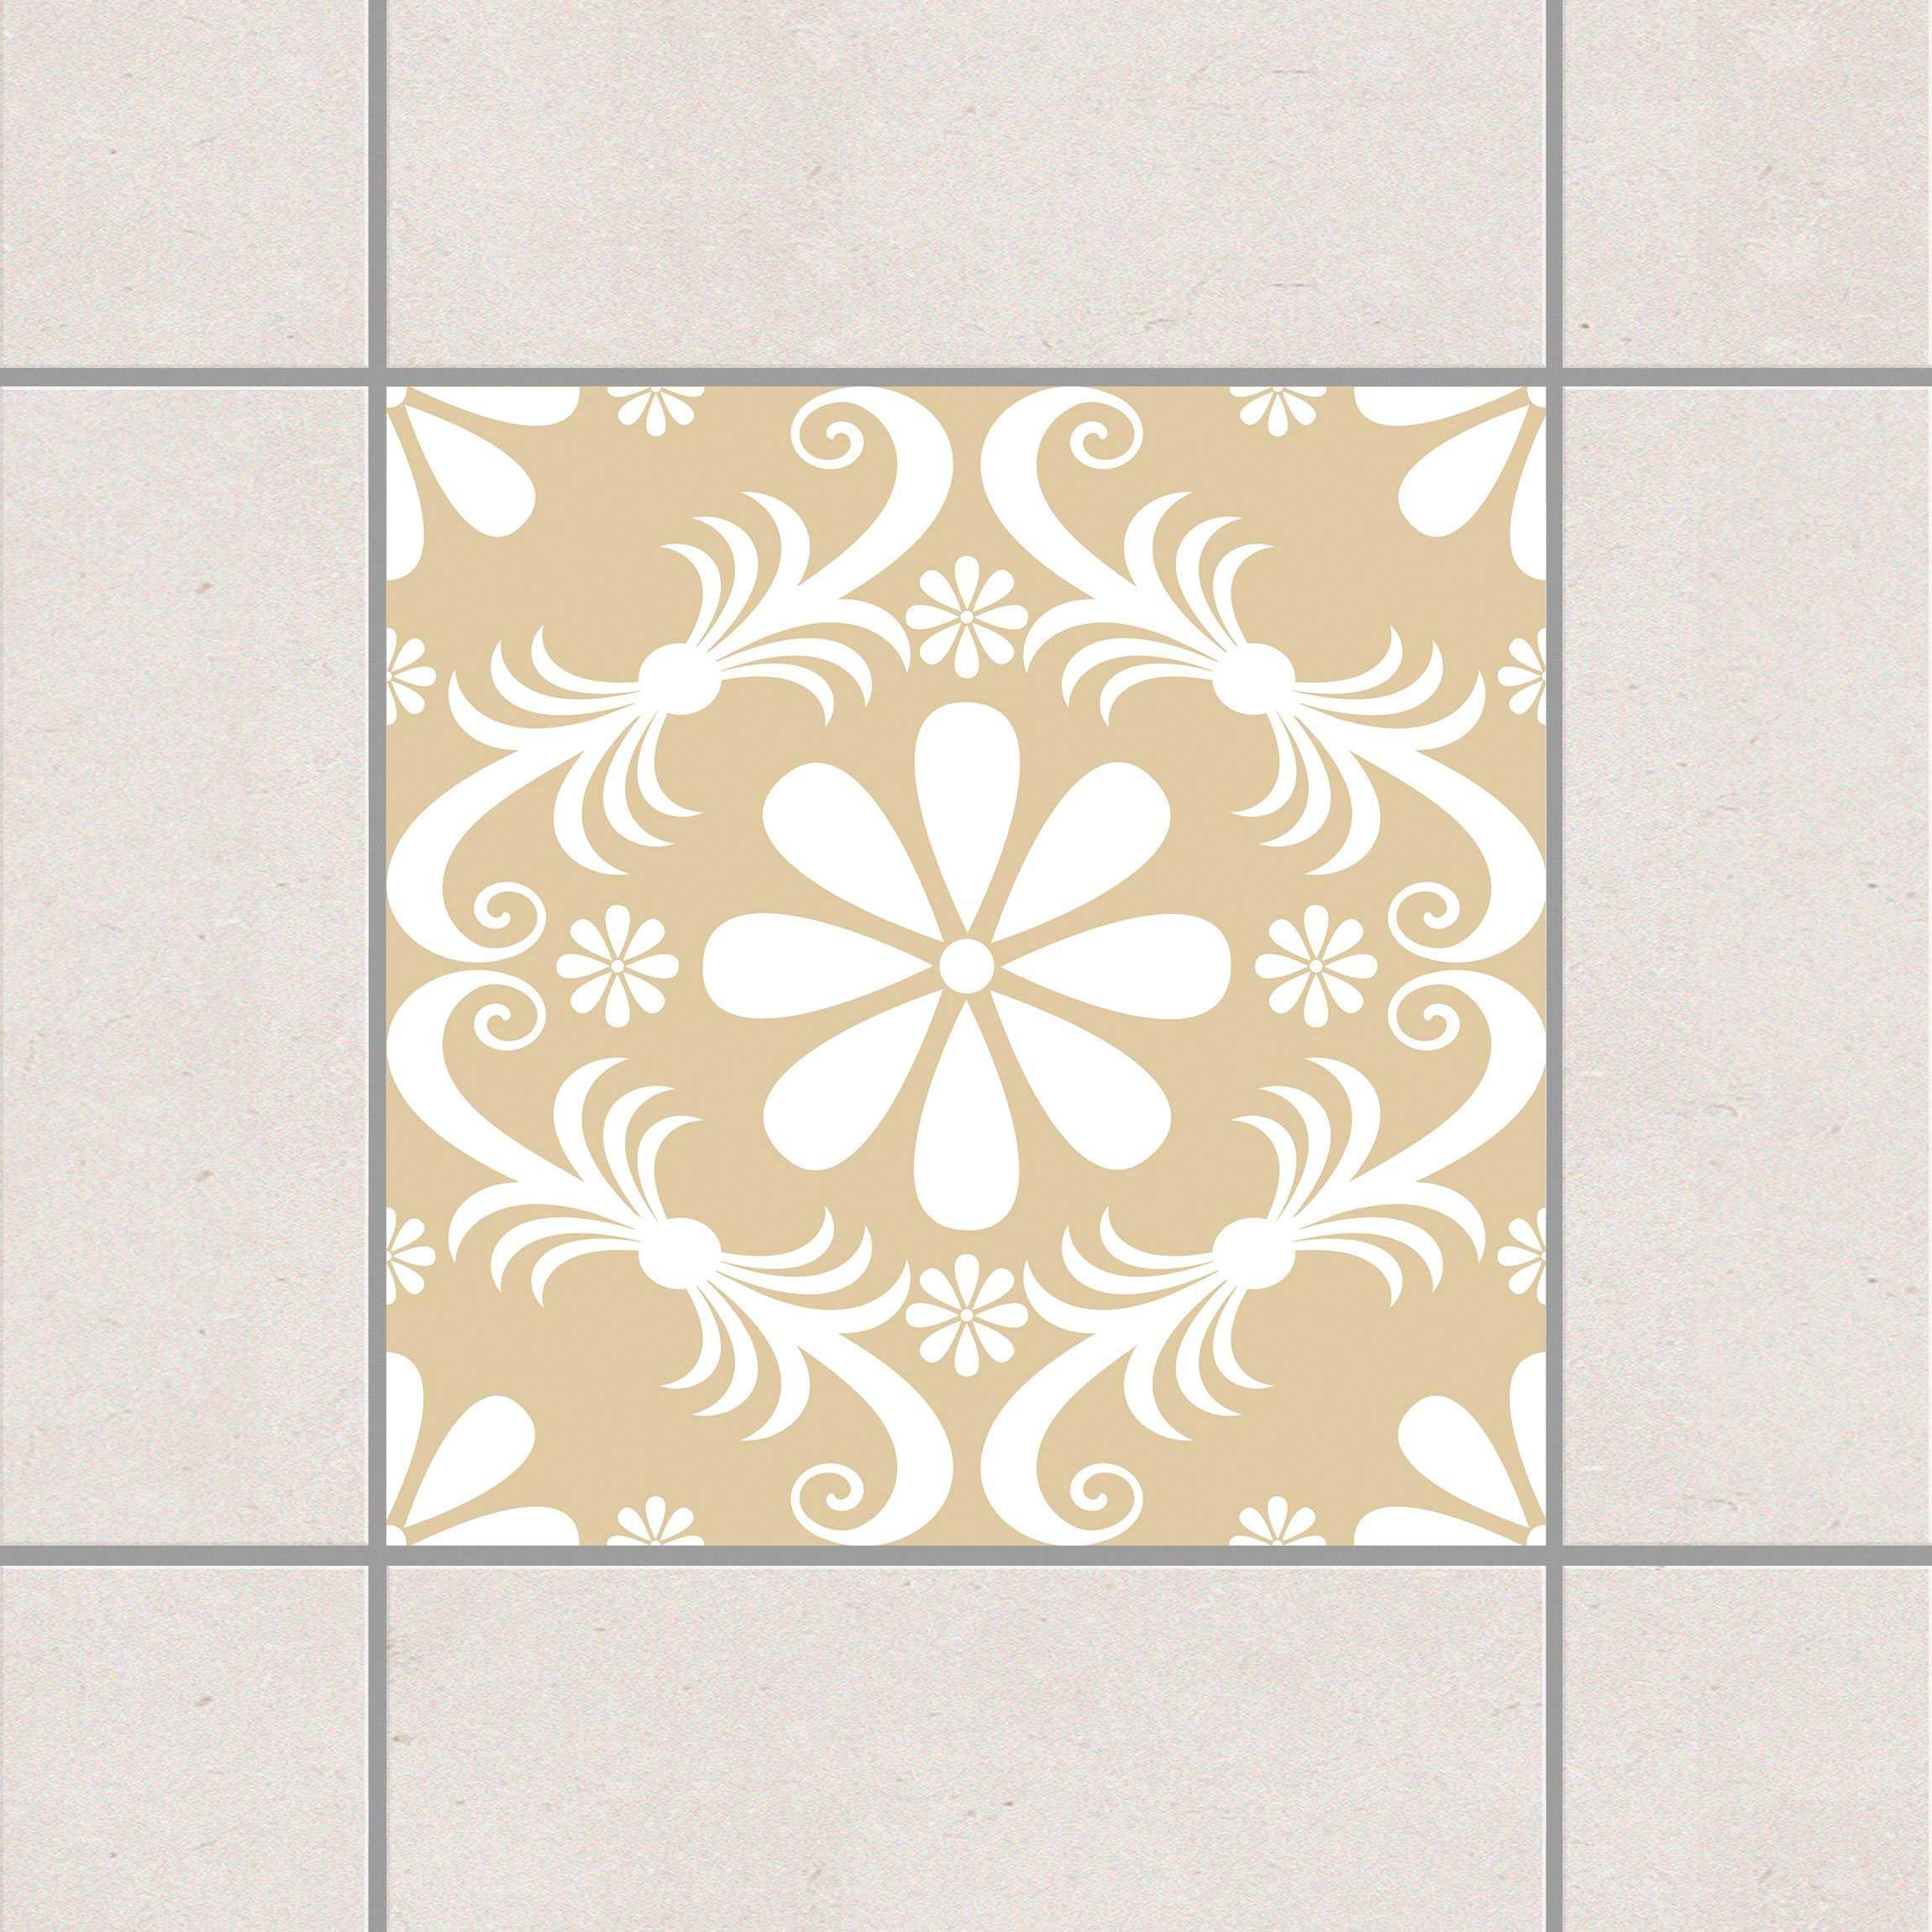 Fliesenaufkleber blumendesign light brown 15x15 cm for Fliesensticker 15x15